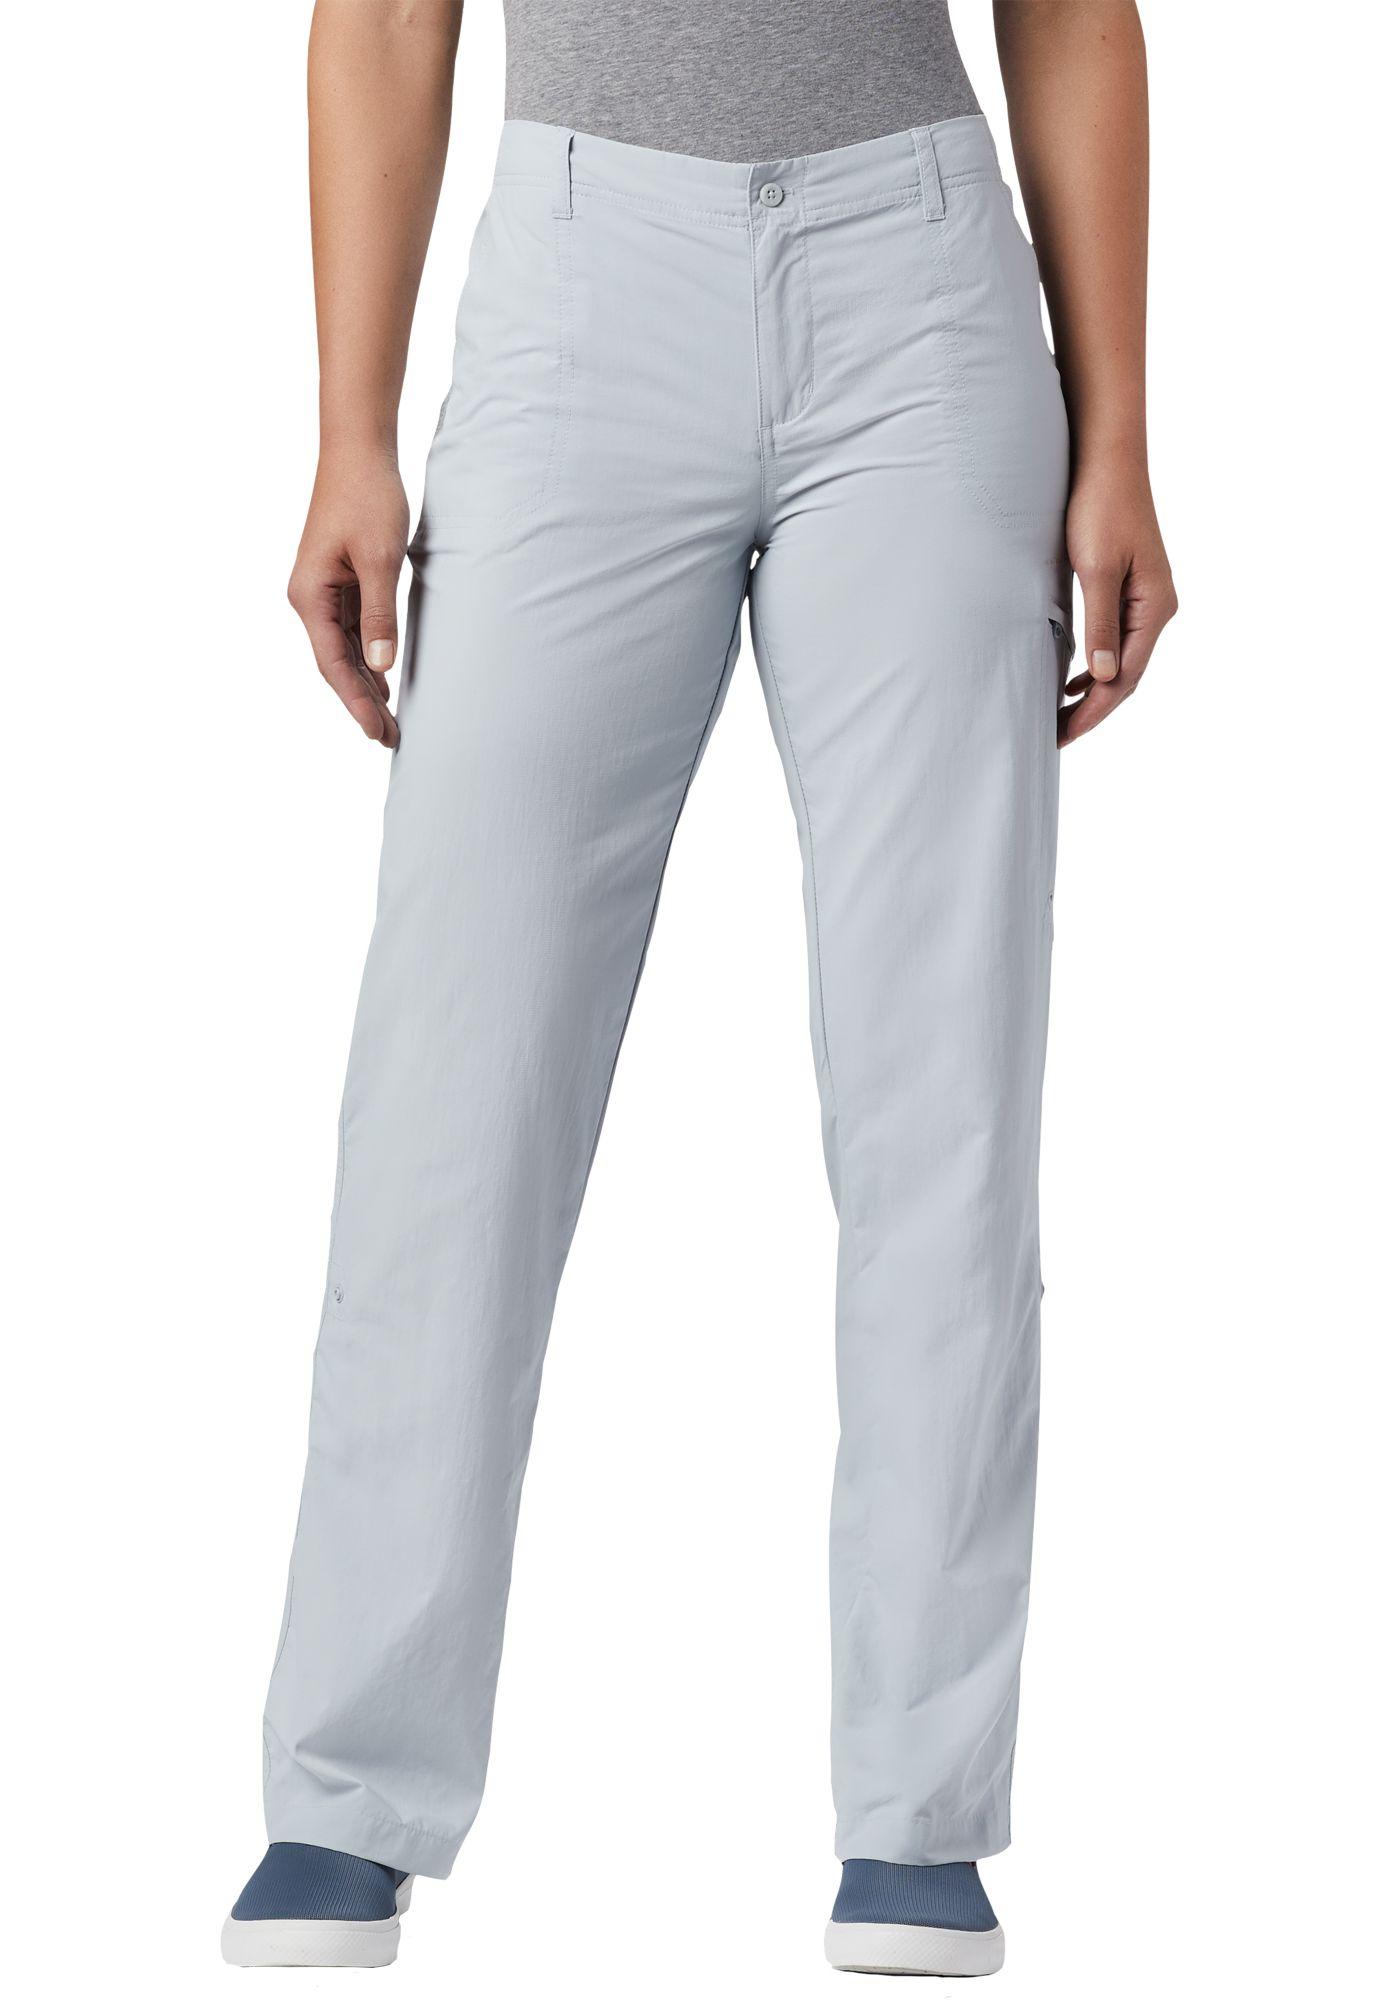 Columbia Women's Aruba Roll Up Pants